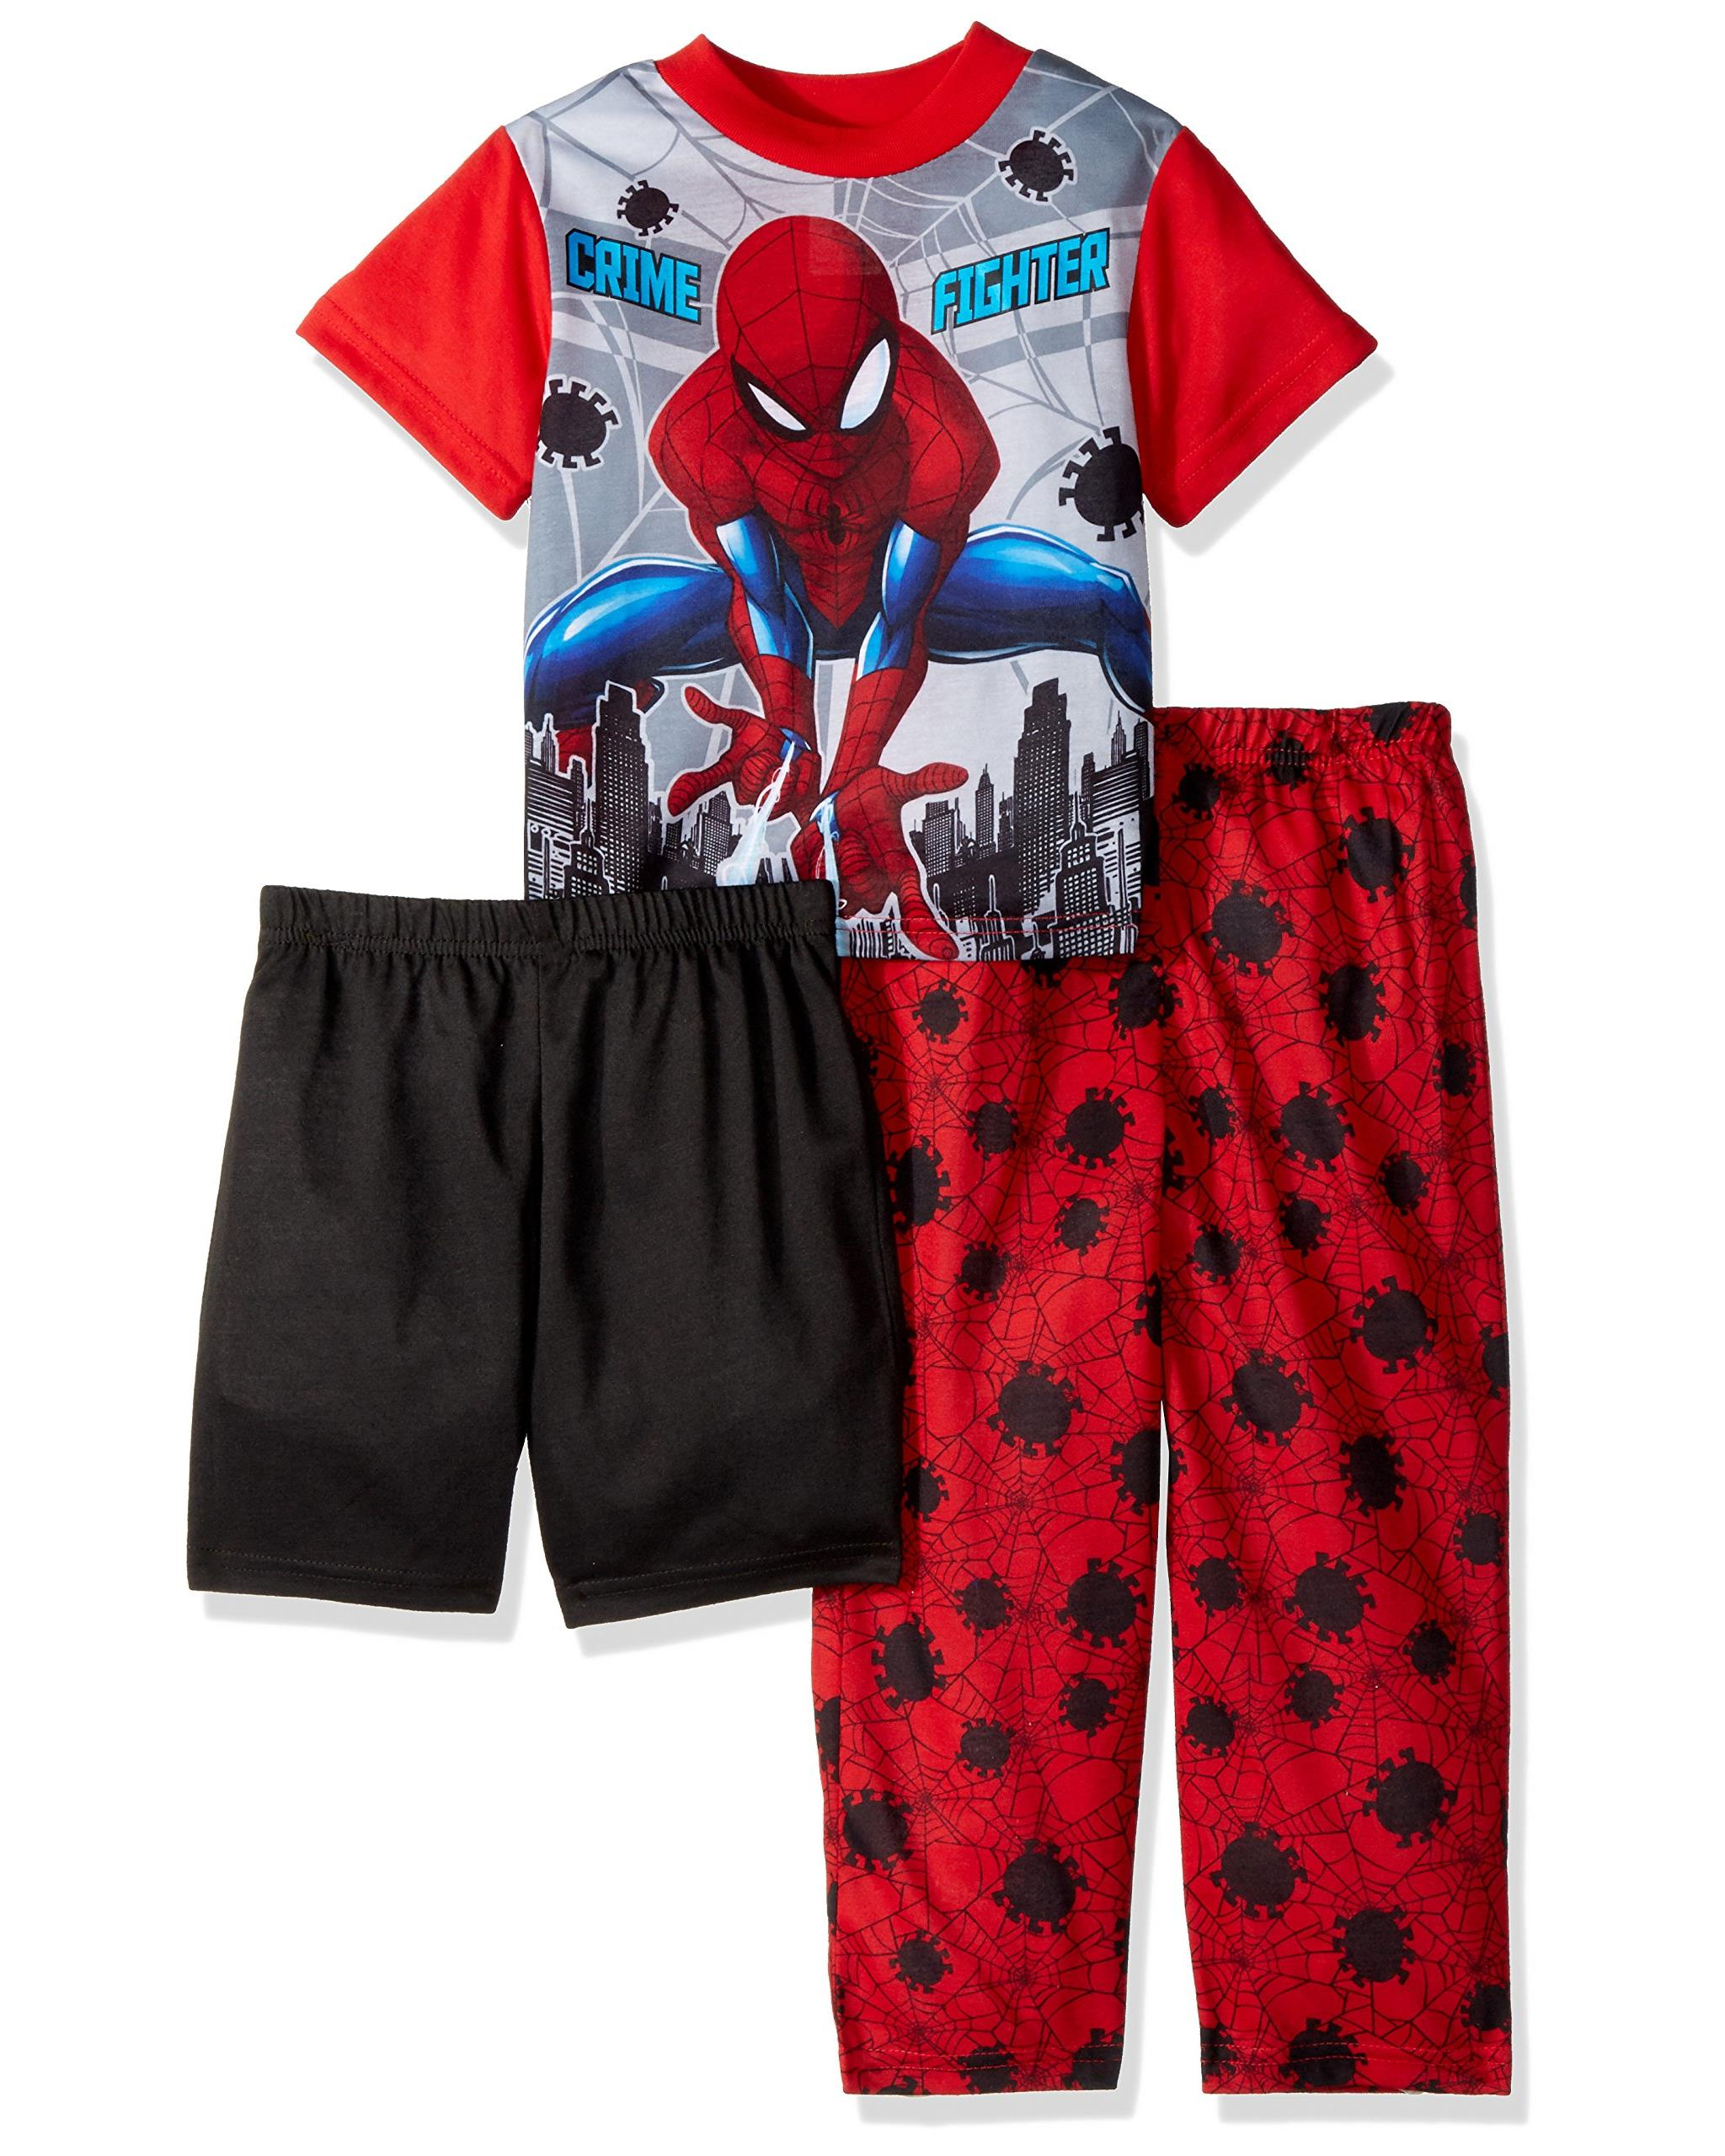 Marvel Boys' Spiderman 3-Piece Pajama Set, Red Web, Size: 10